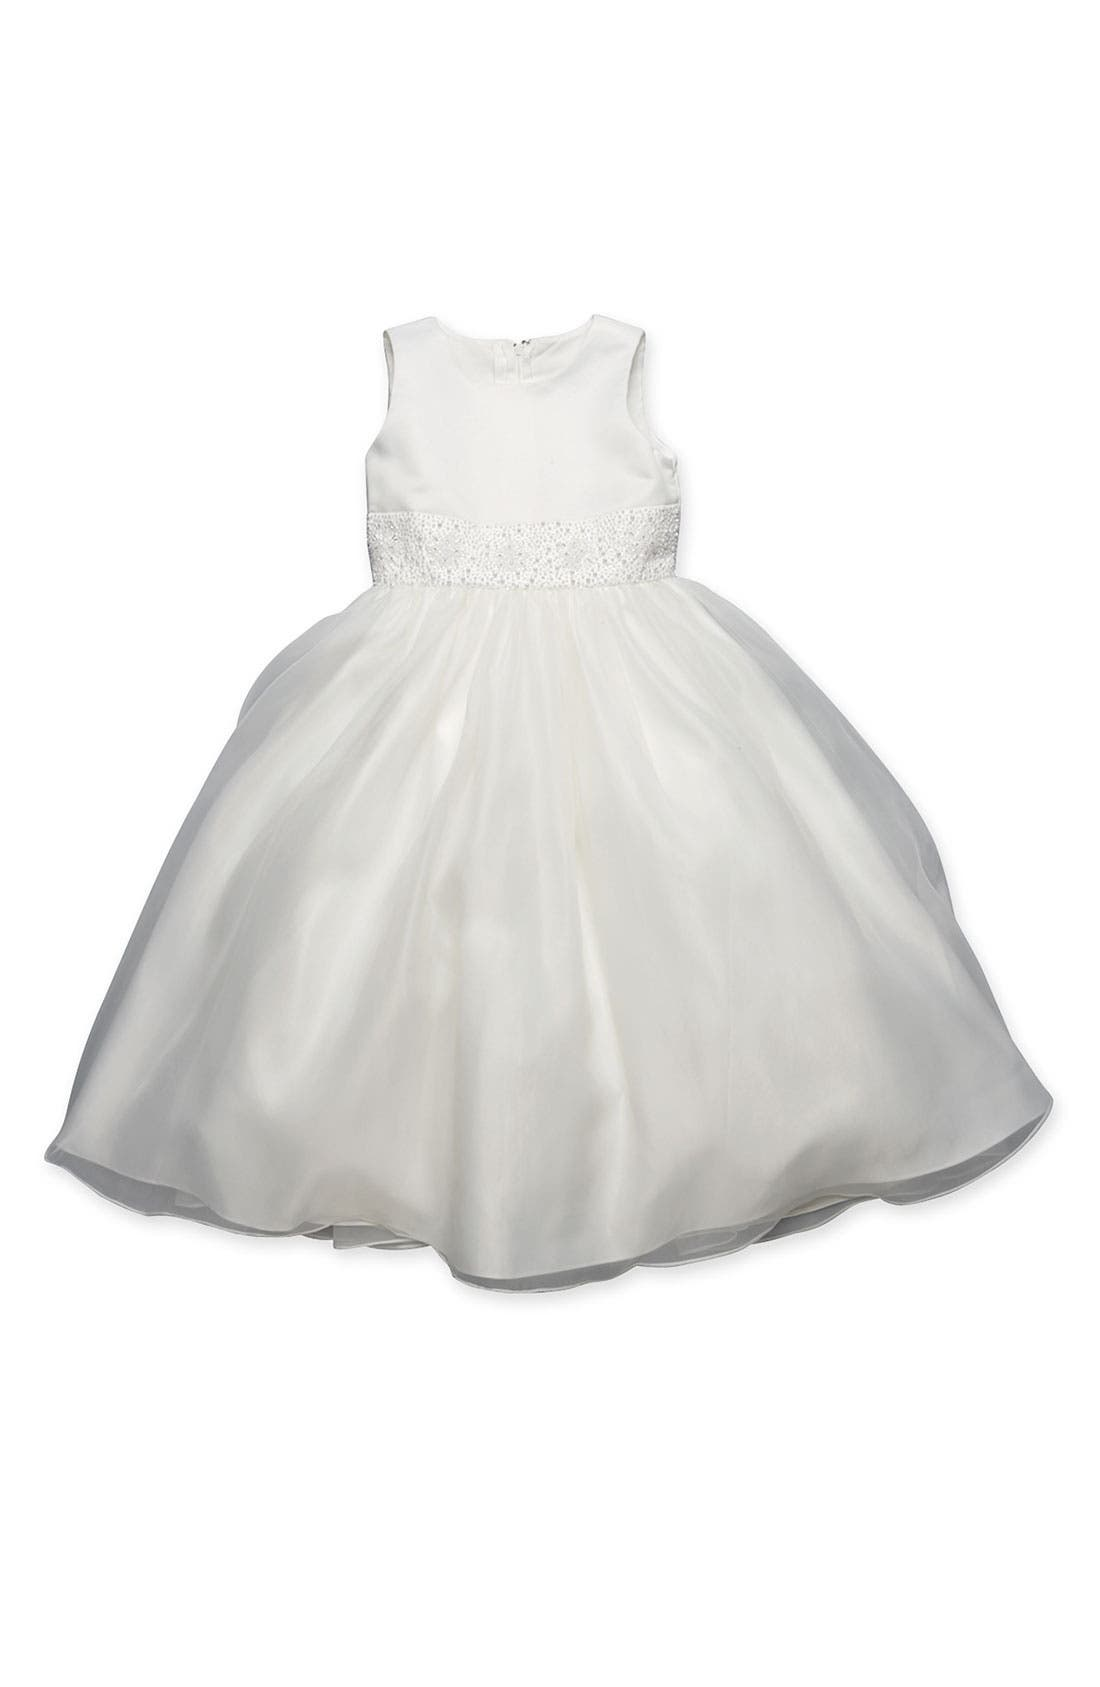 Beaded Satin Sleeveless Dress,                             Alternate thumbnail 2, color,                             IVORY 2